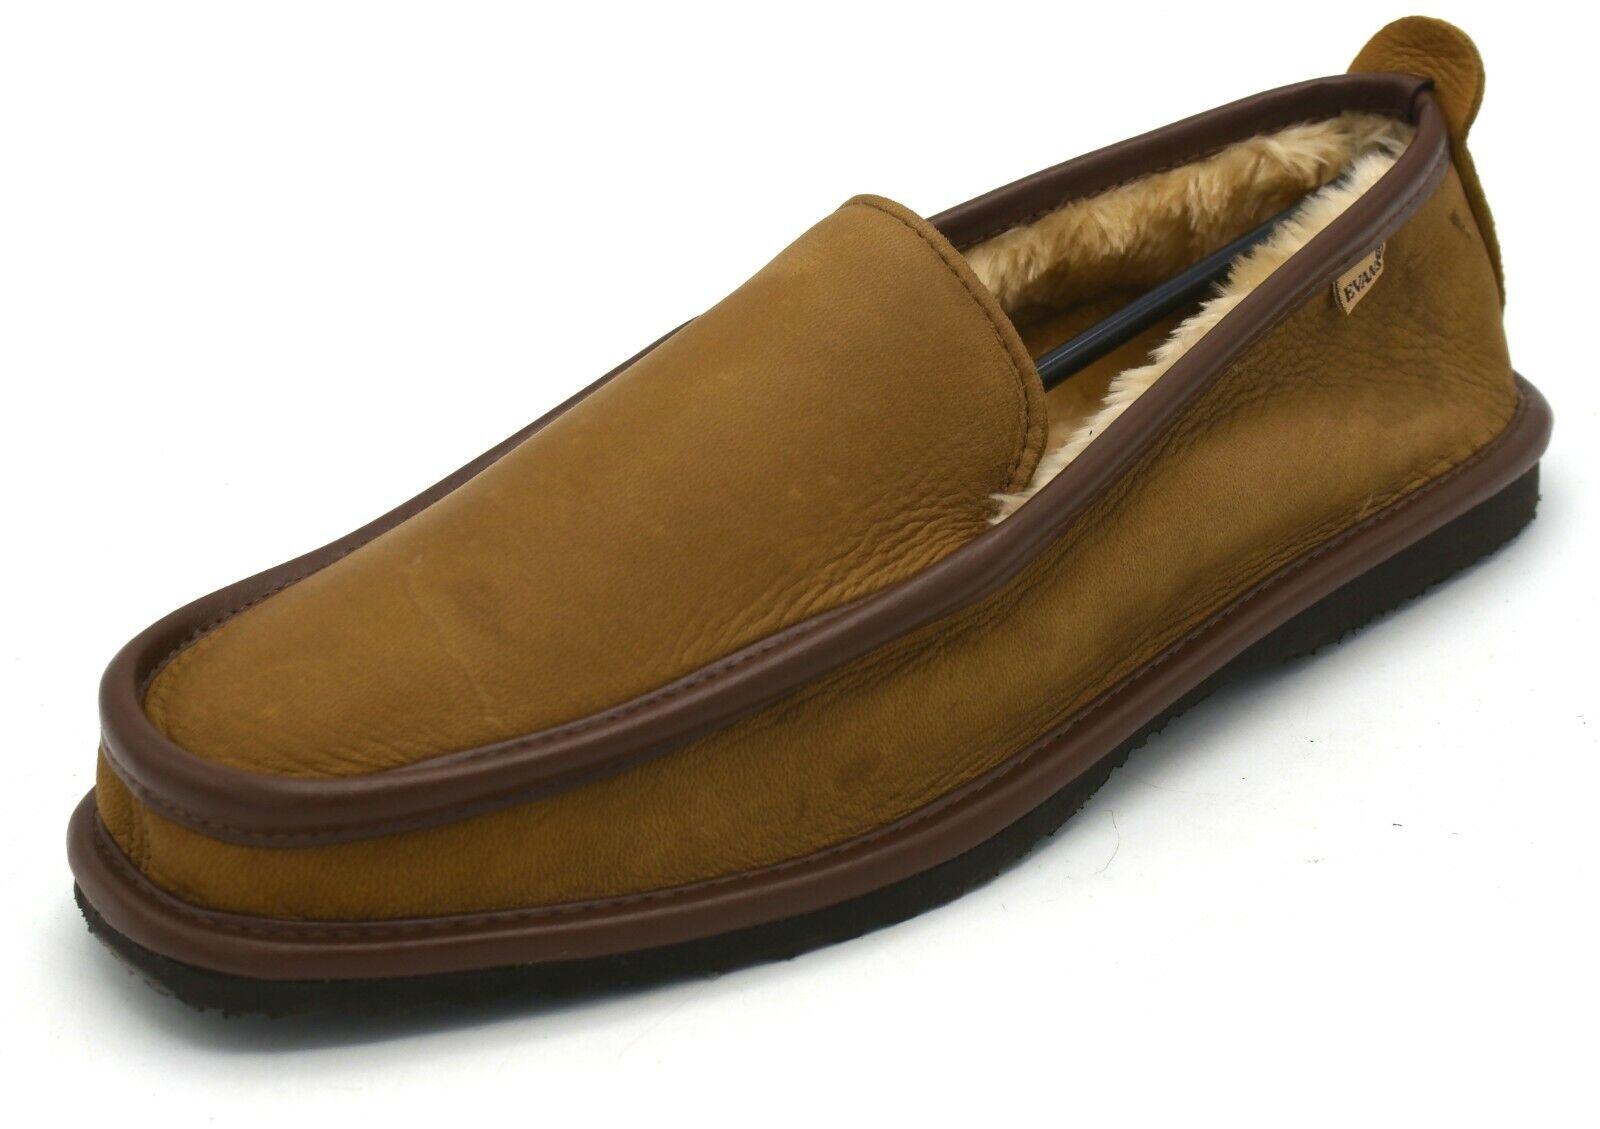 J8391 New Men's L.B. Evans Imperial Deer Mocha Brown Loafer 12 EEE